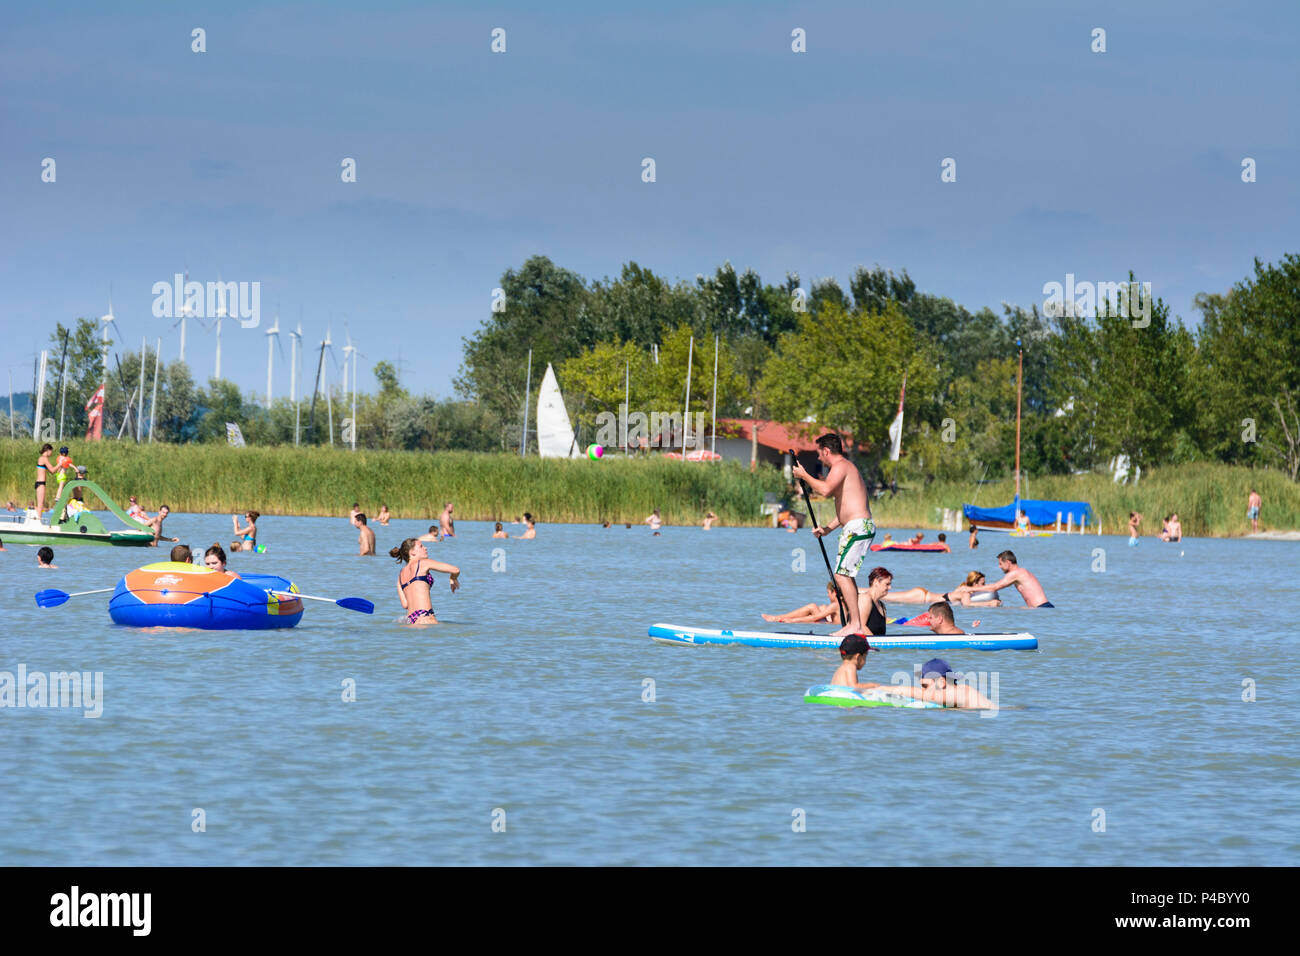 Podersdorf Am See öffentliche Strandbad Lido Neusiedler See